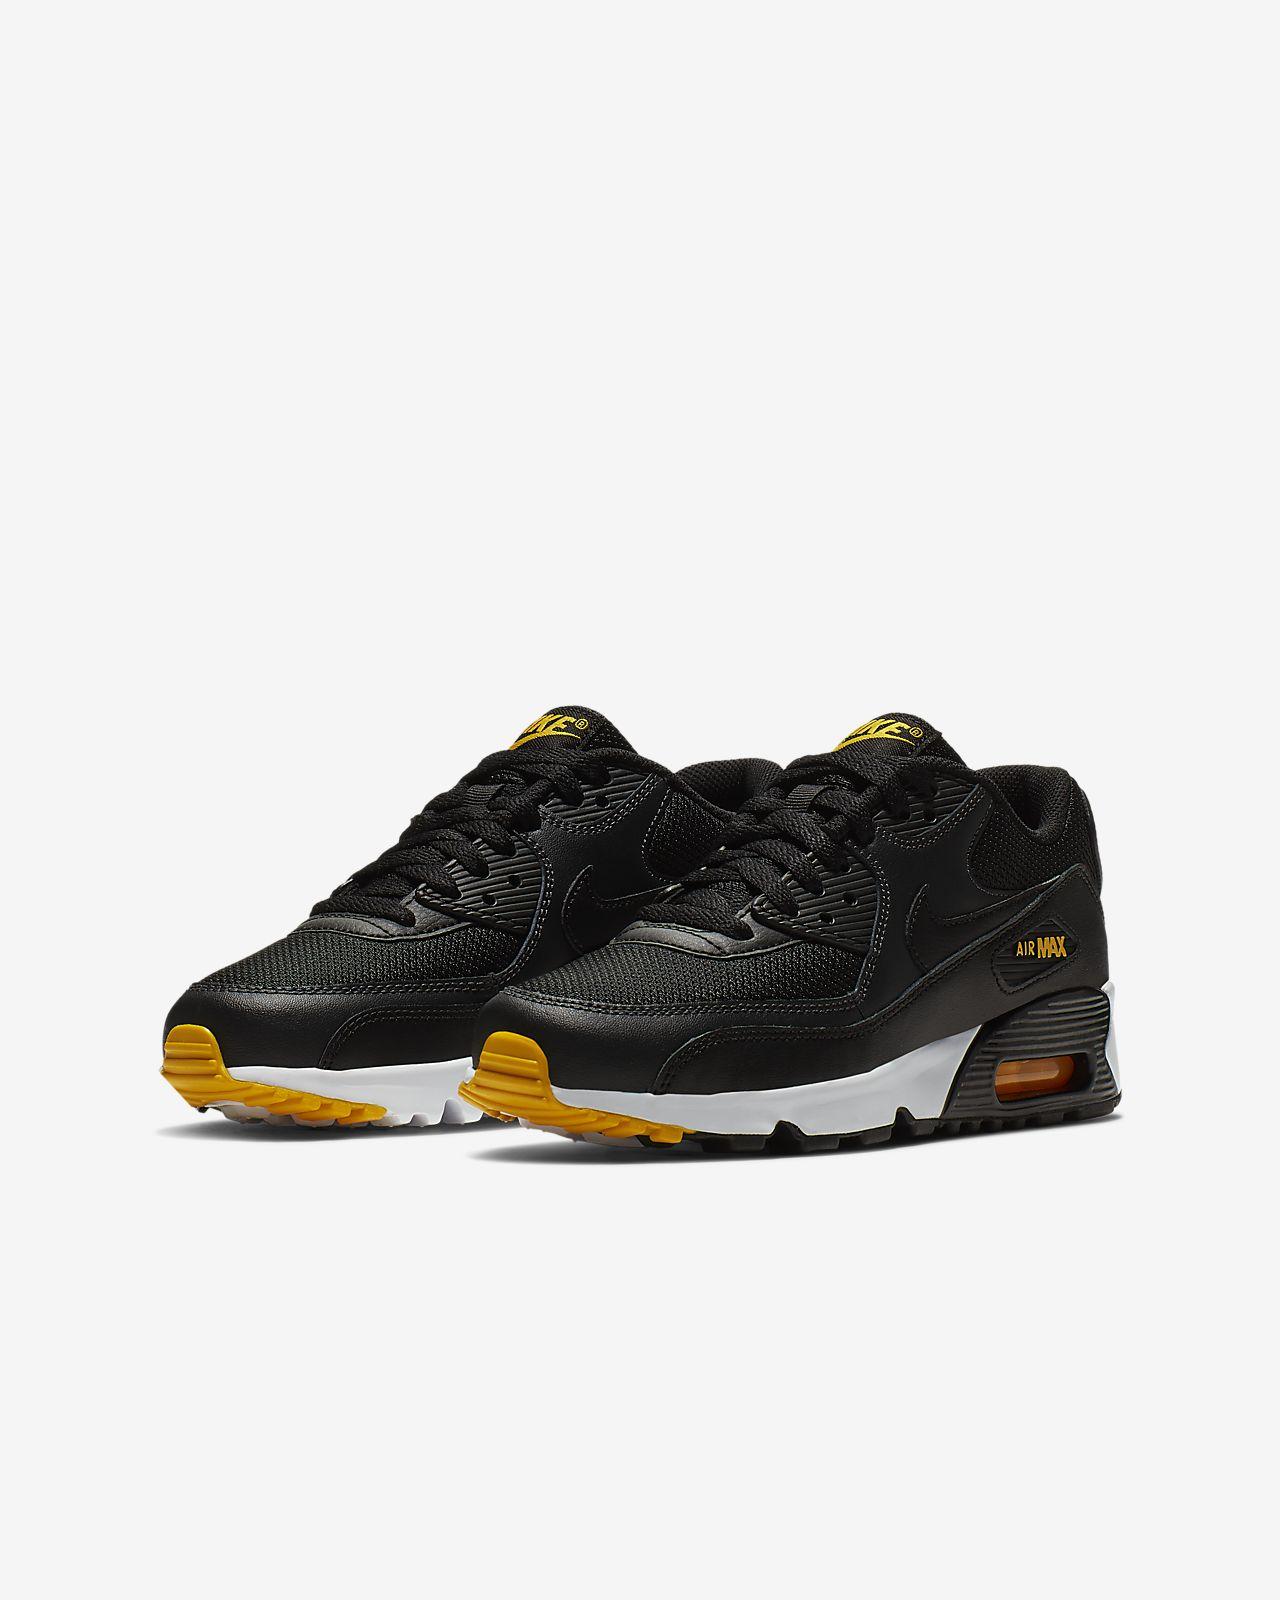 Max Nike Air Schuh für Kinder 90 Mesh ältere xBodCe